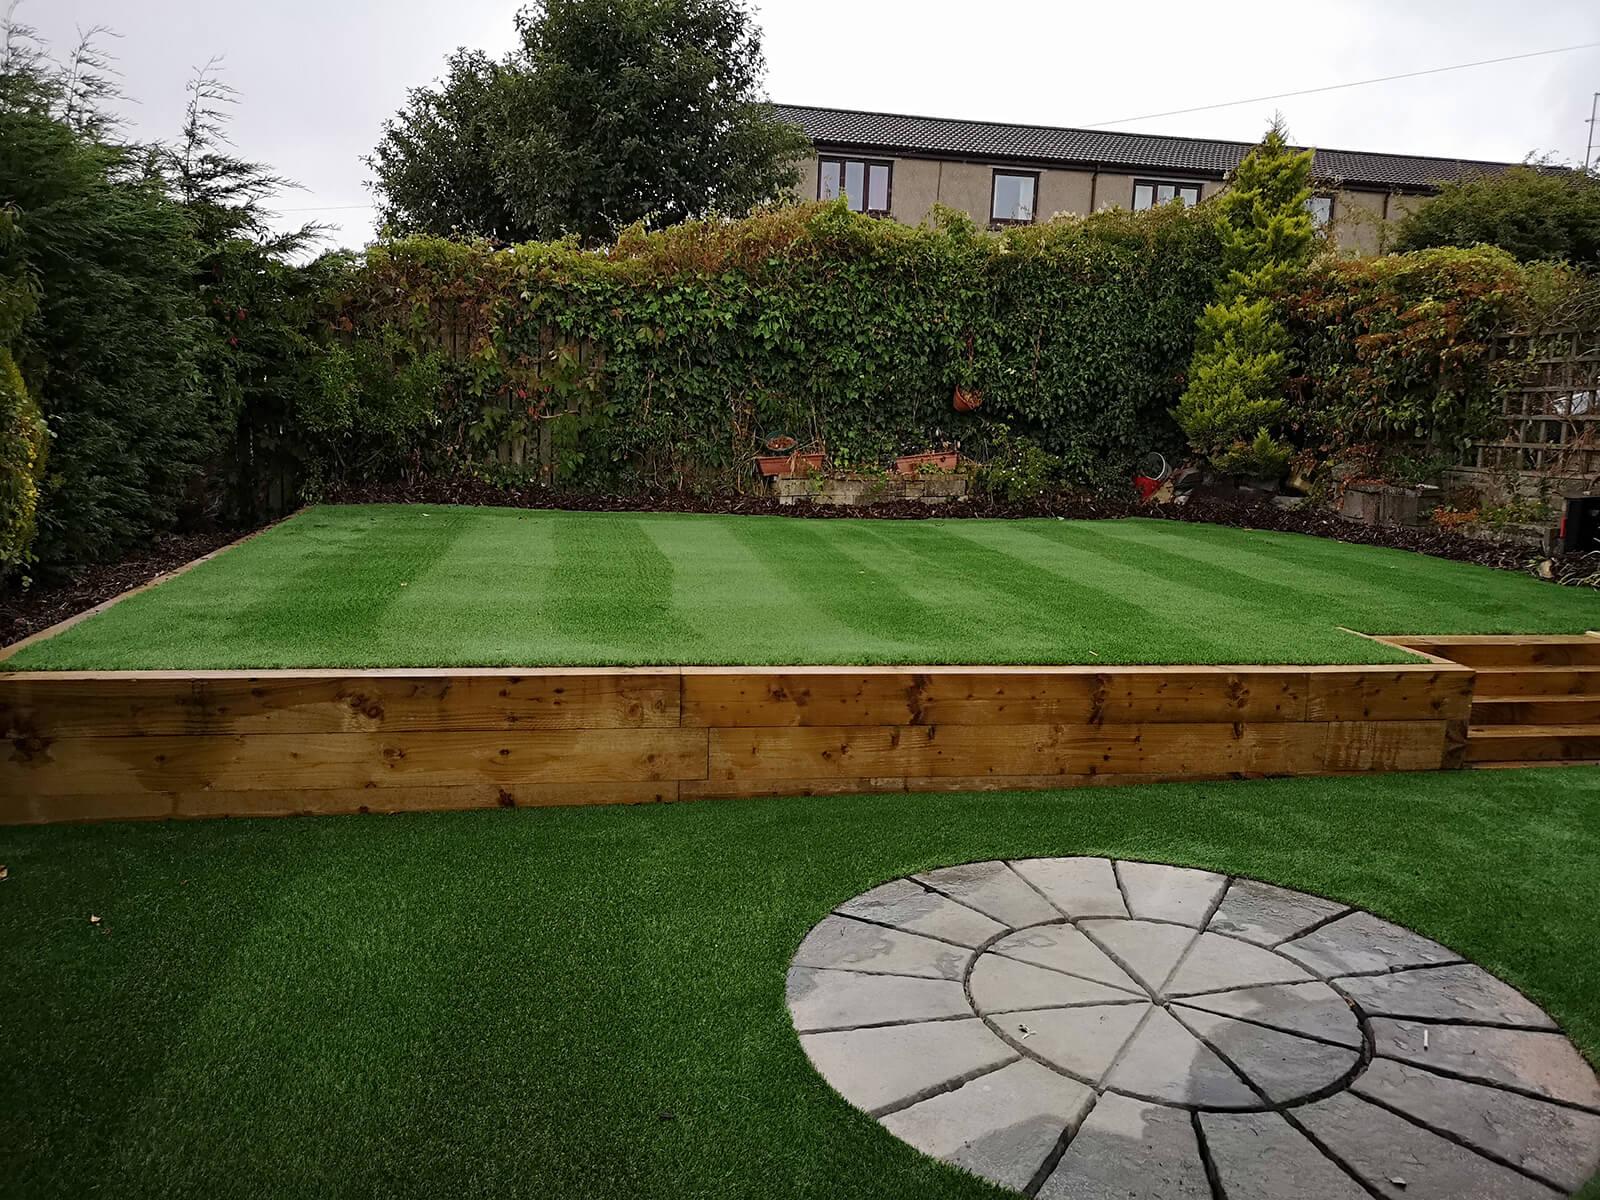 Landscaping & Artificial Grass Installation Heysham, Lancashire